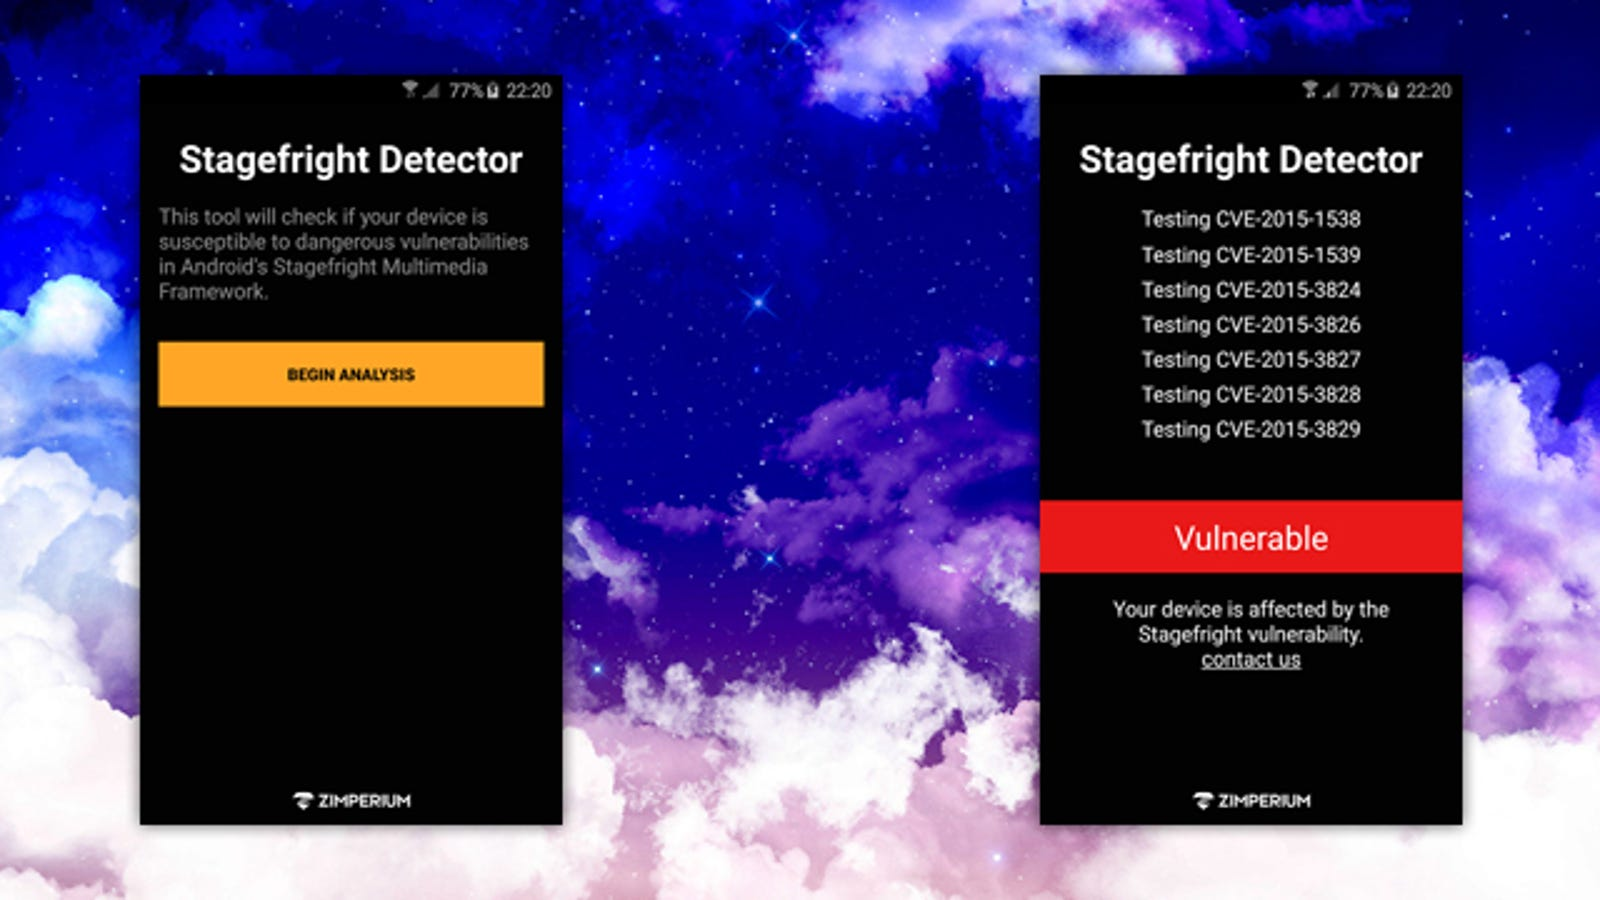 stagefright vulnerability fix